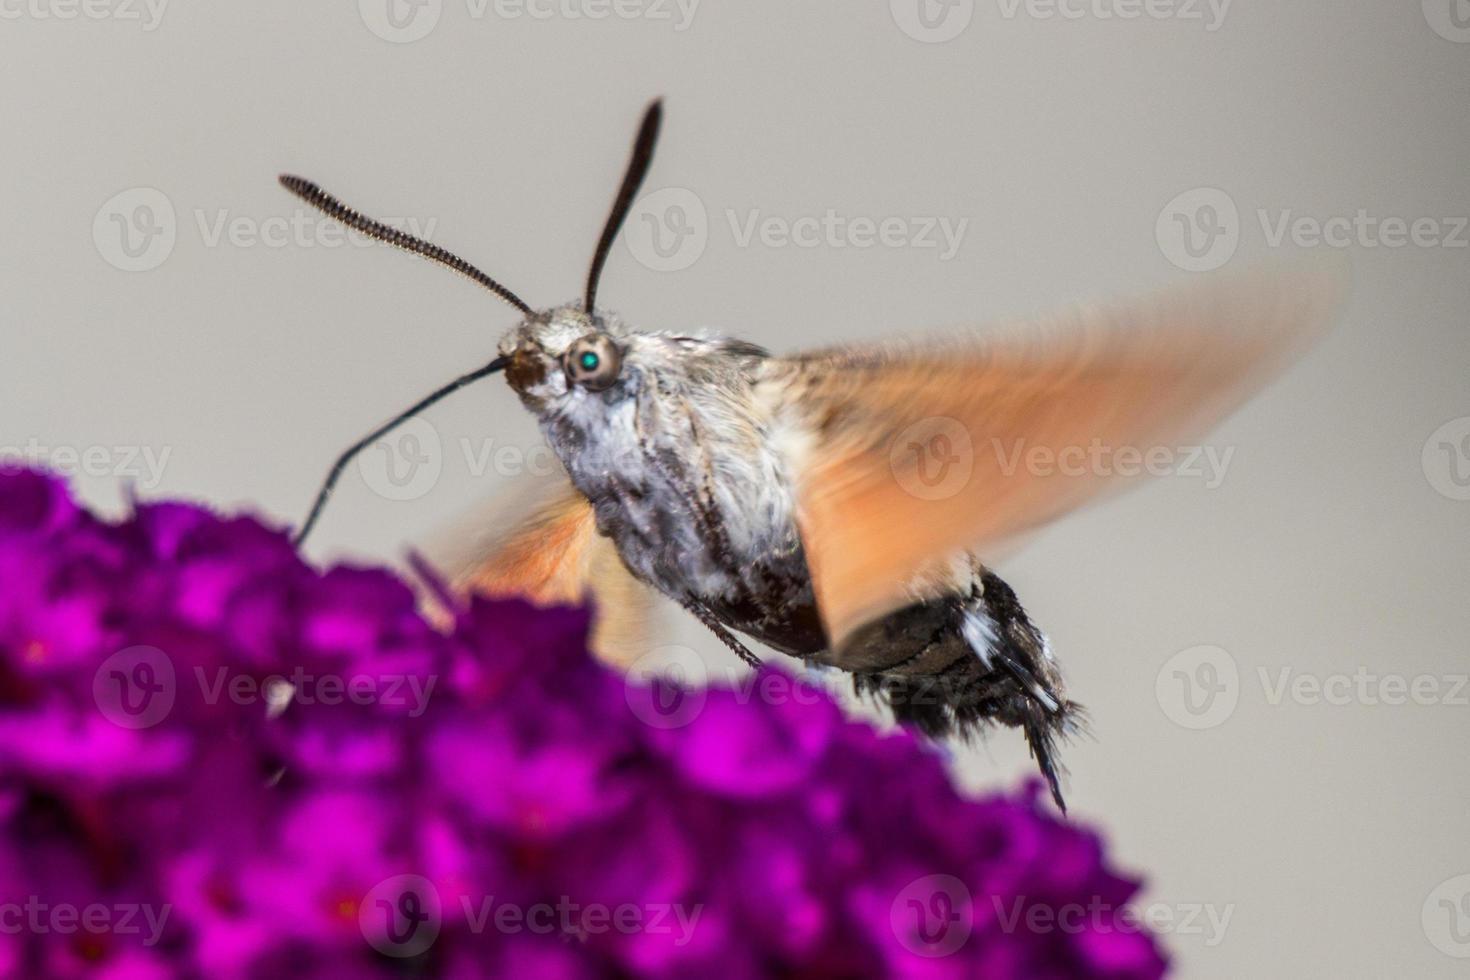 colibri faucon-papillon sur buddleja davidii photo